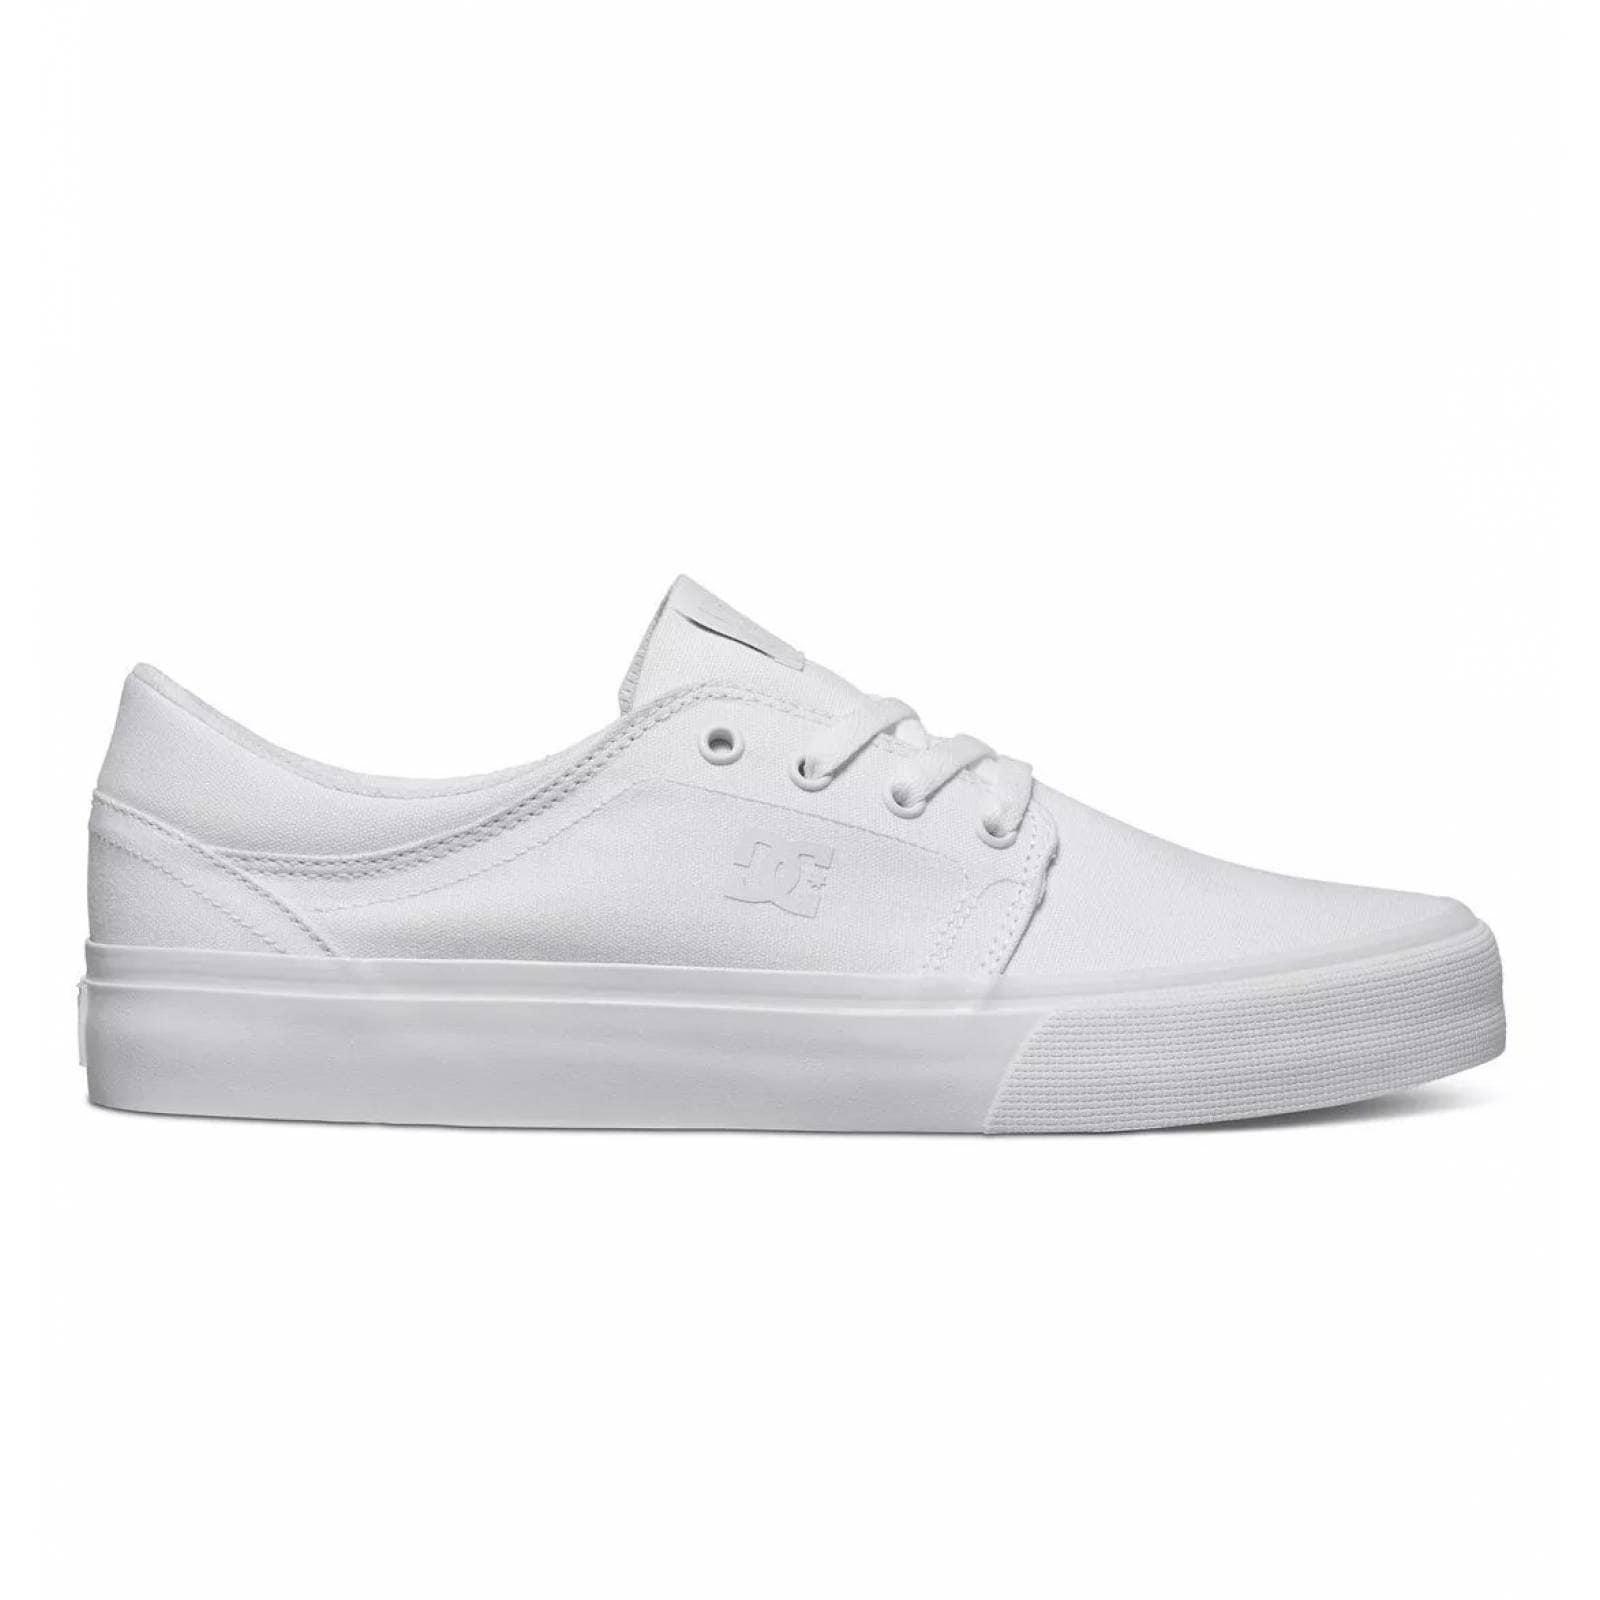 Tenis Dc Shoes Trase Tx